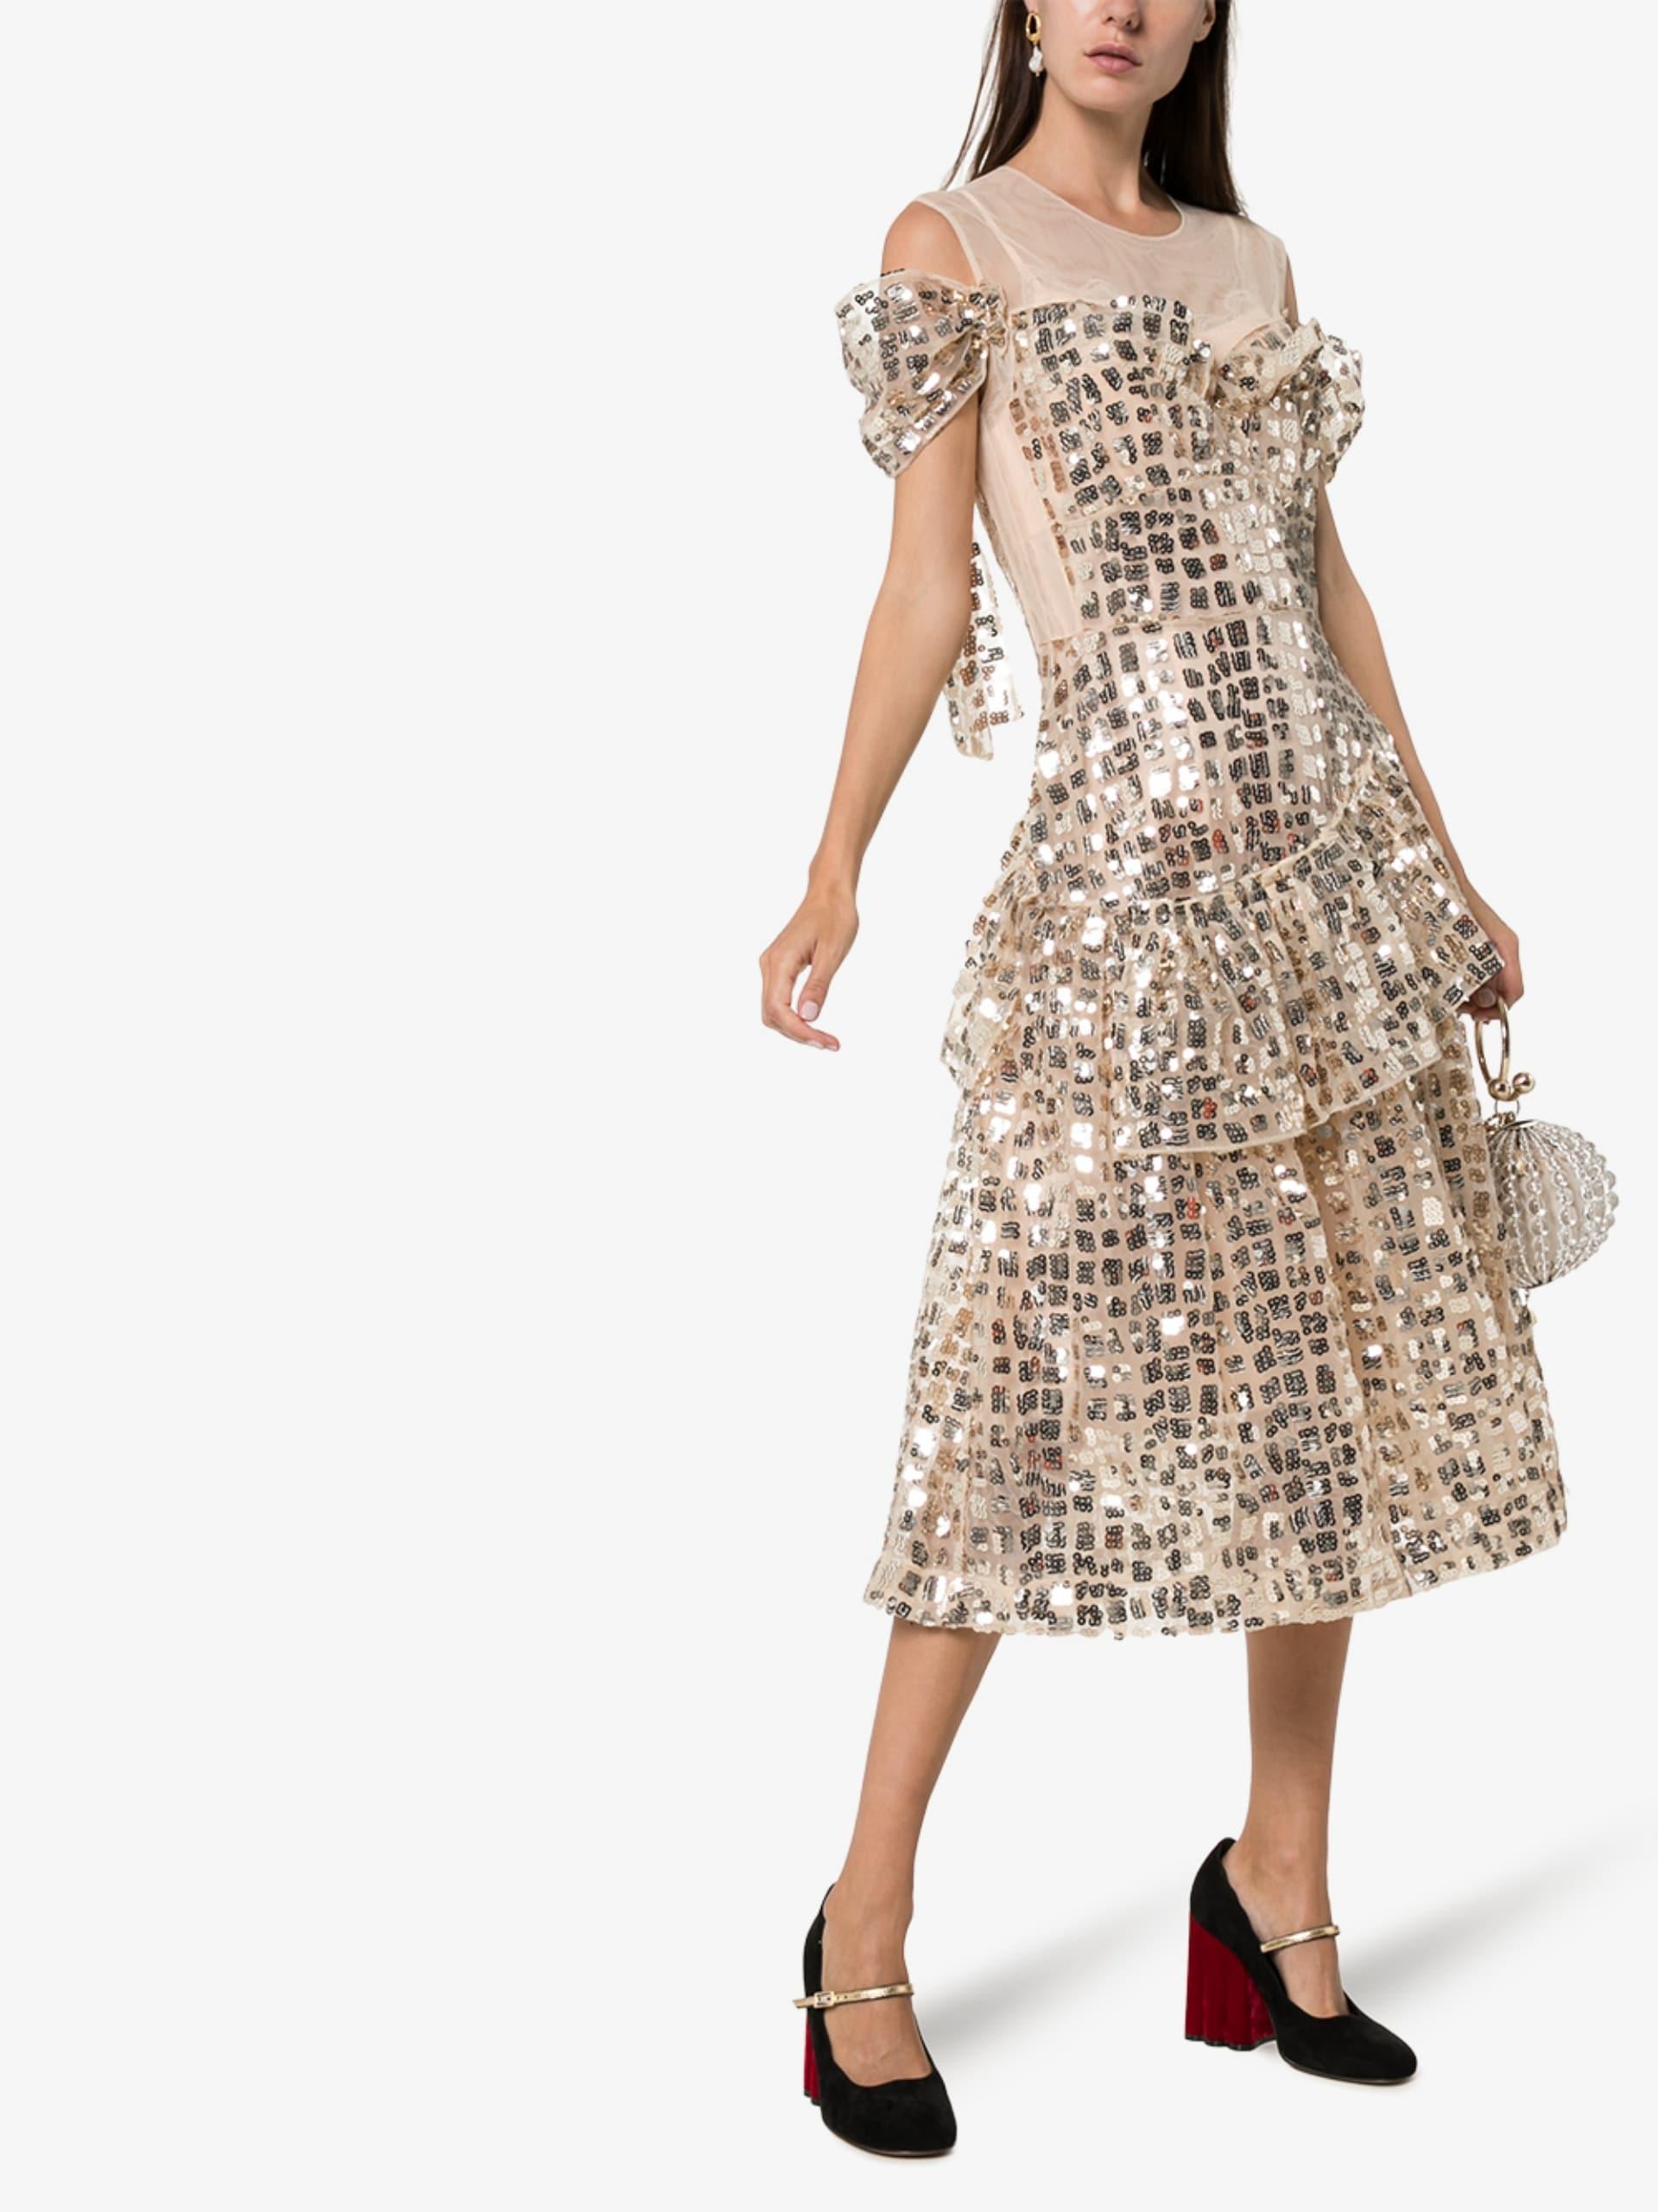 SIMONE ROCHA Ruffled Sequin Dress